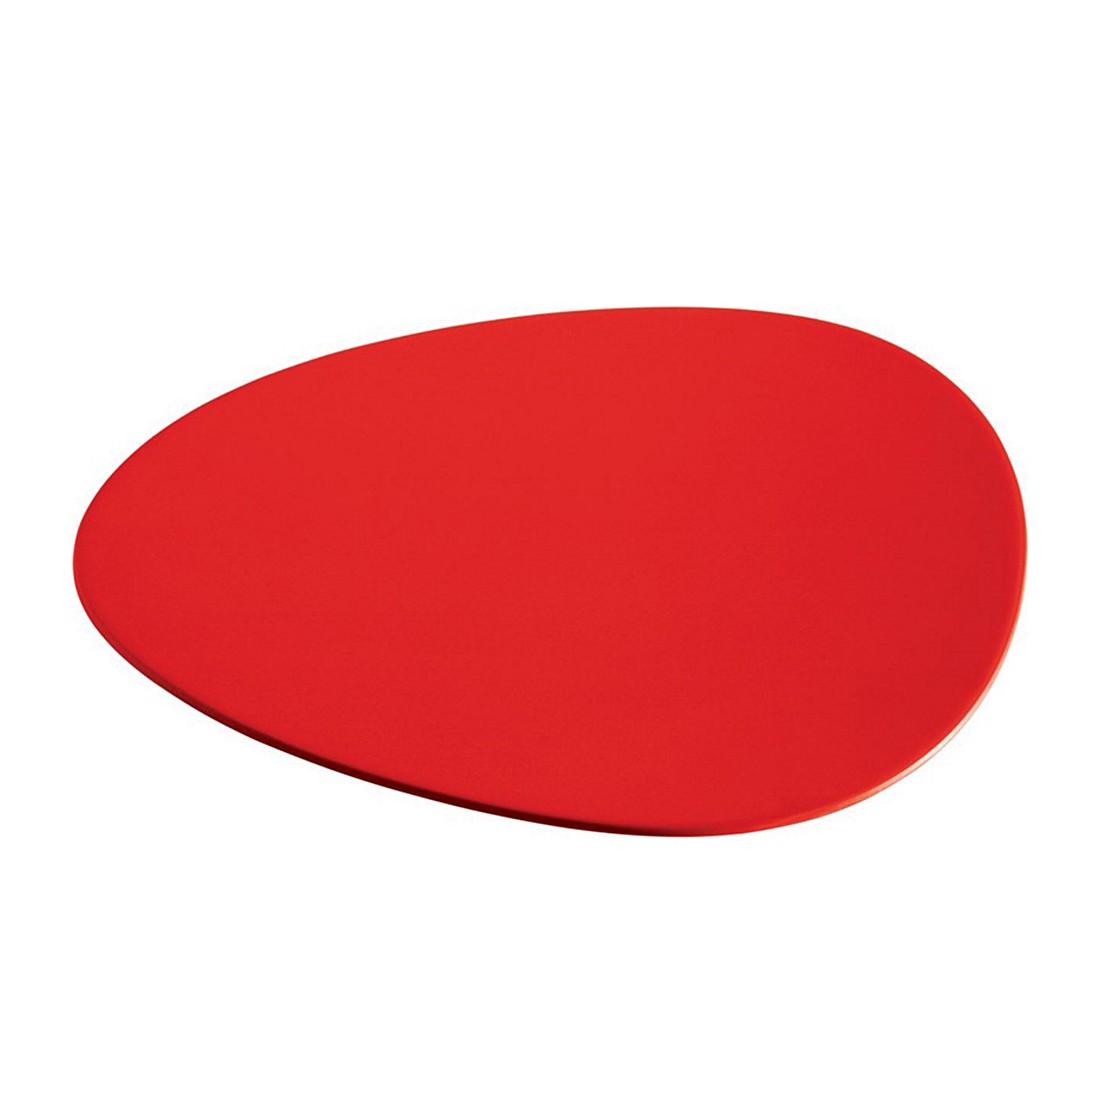 Platzteller Colombina Collection(4er-Set) – rot, Alessi online bestellen